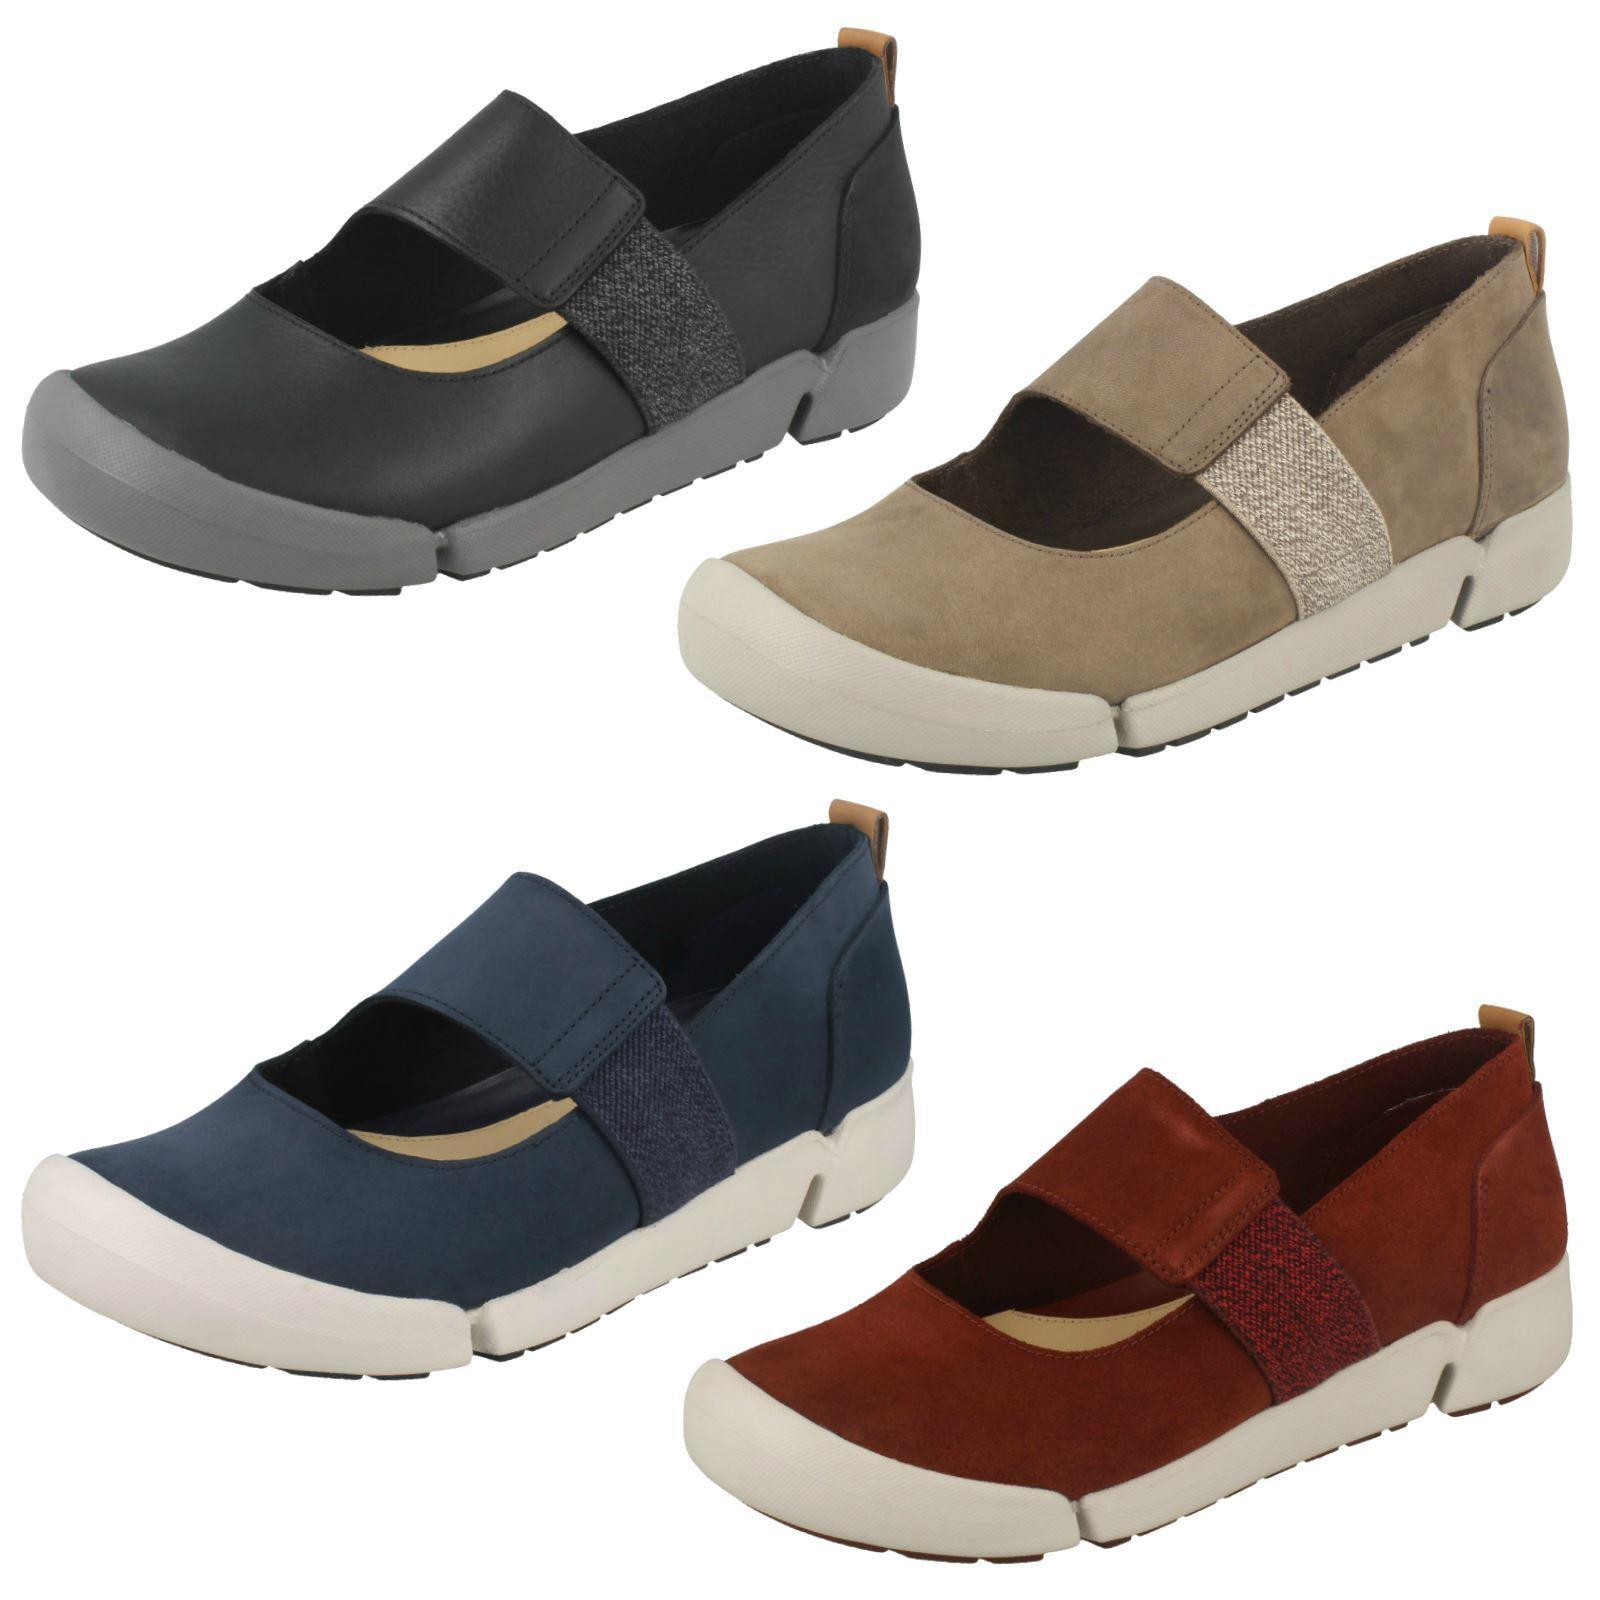 117f528b5b93e Femmes Clarks Chaussures De   Loisirs   De Tri Ava   46473c ...